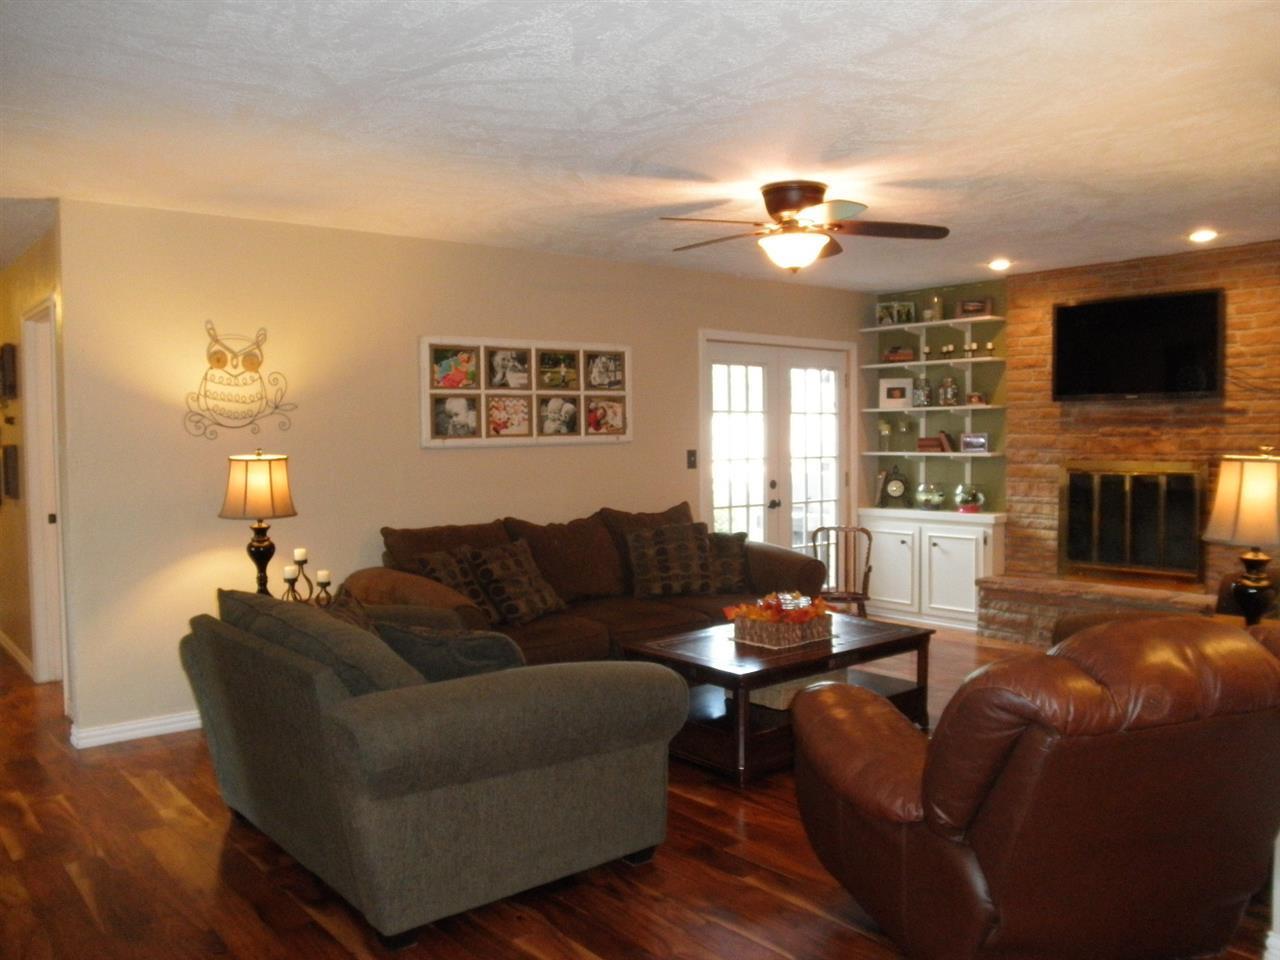 Sold Intraoffice W/MLS | 1504 Trio Lane  Ponca City, OK 74604 3